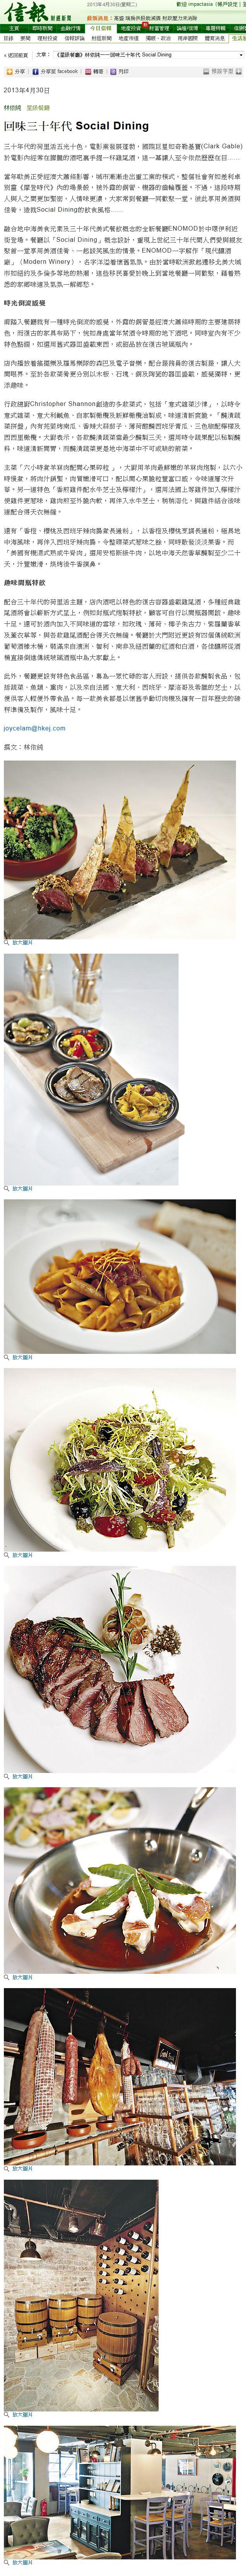 ENOMOD - 30.04 - Hong Kong Economic Journal (online).jpg